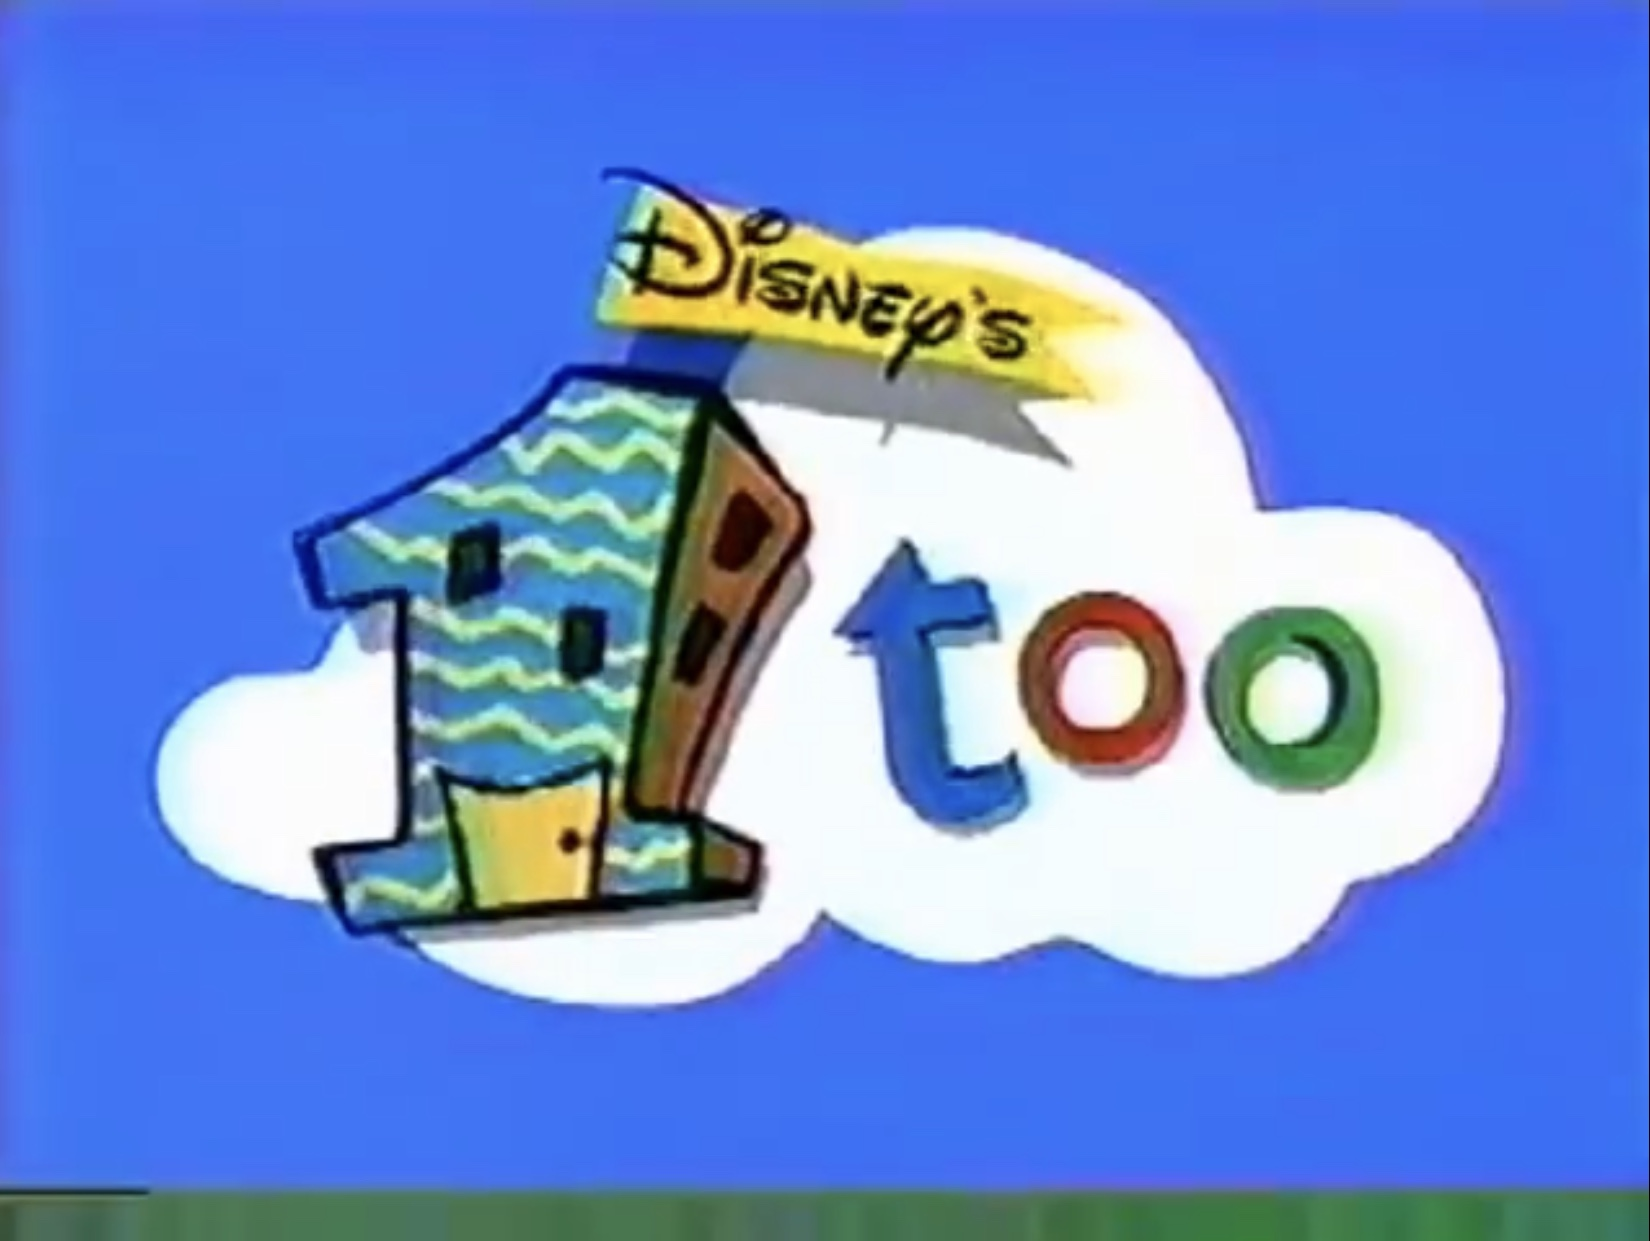 File:Disney's One Too logo.jpg